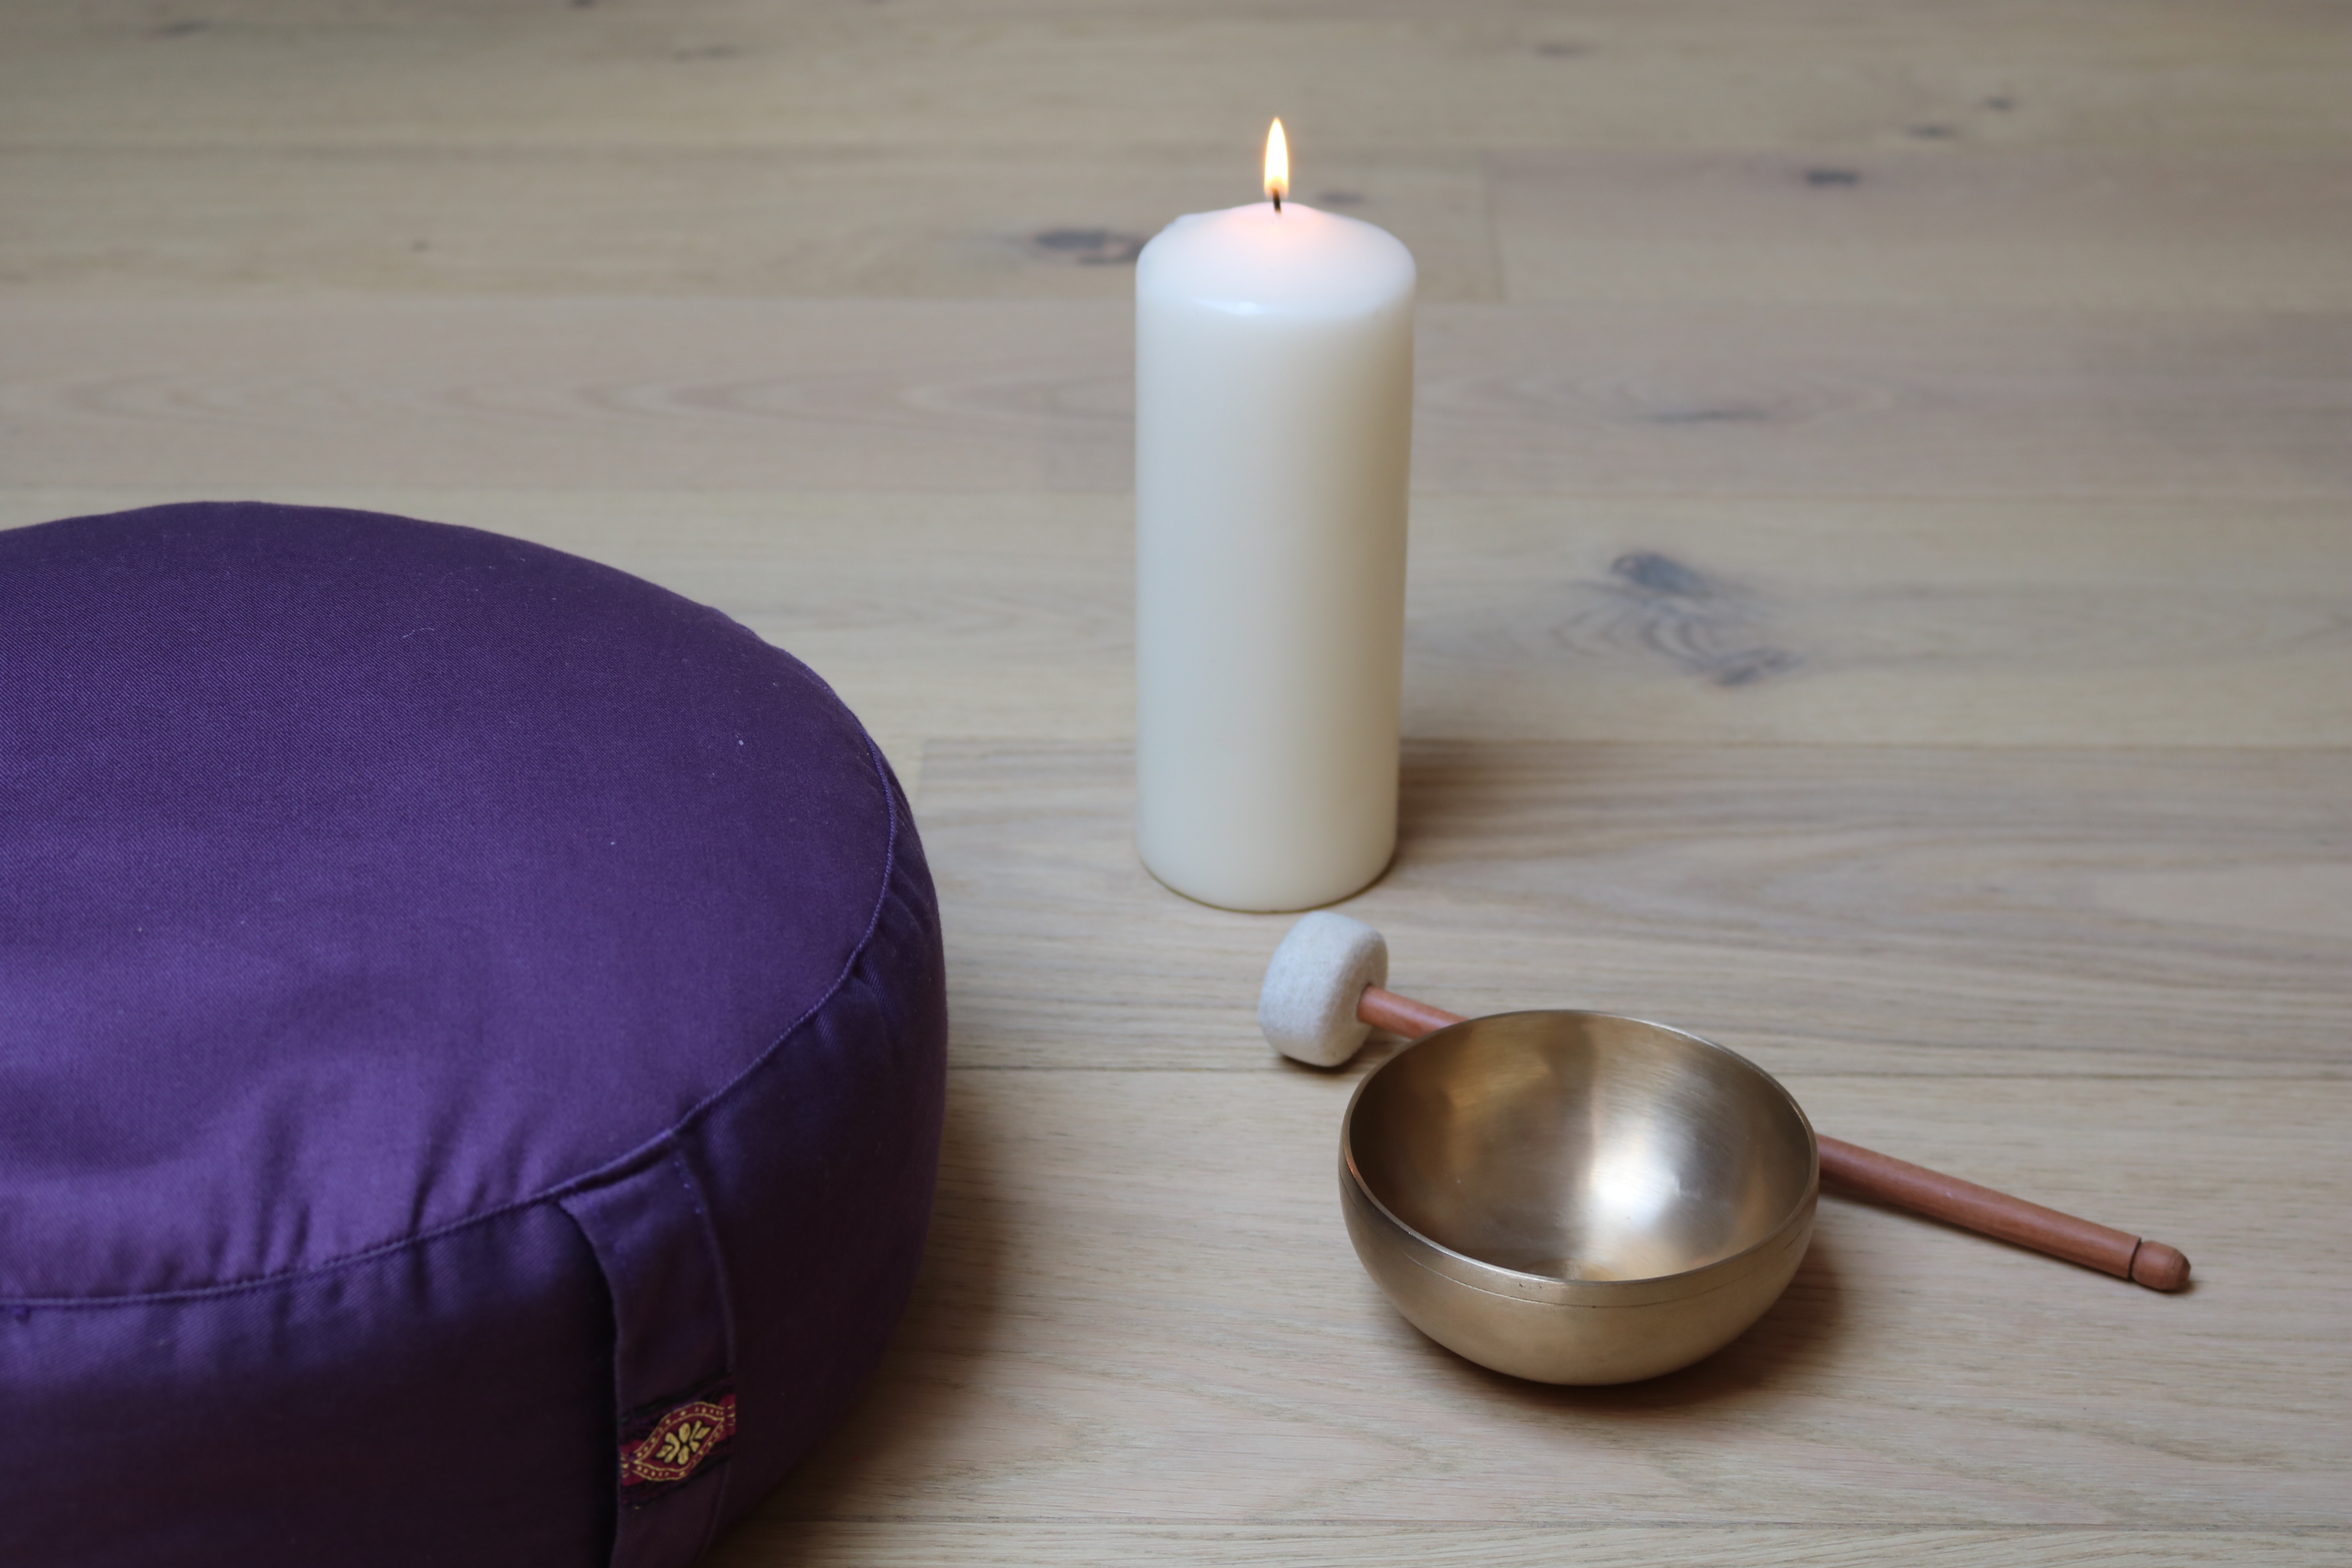 Kinderyoga - Tratak mit einer Kerze